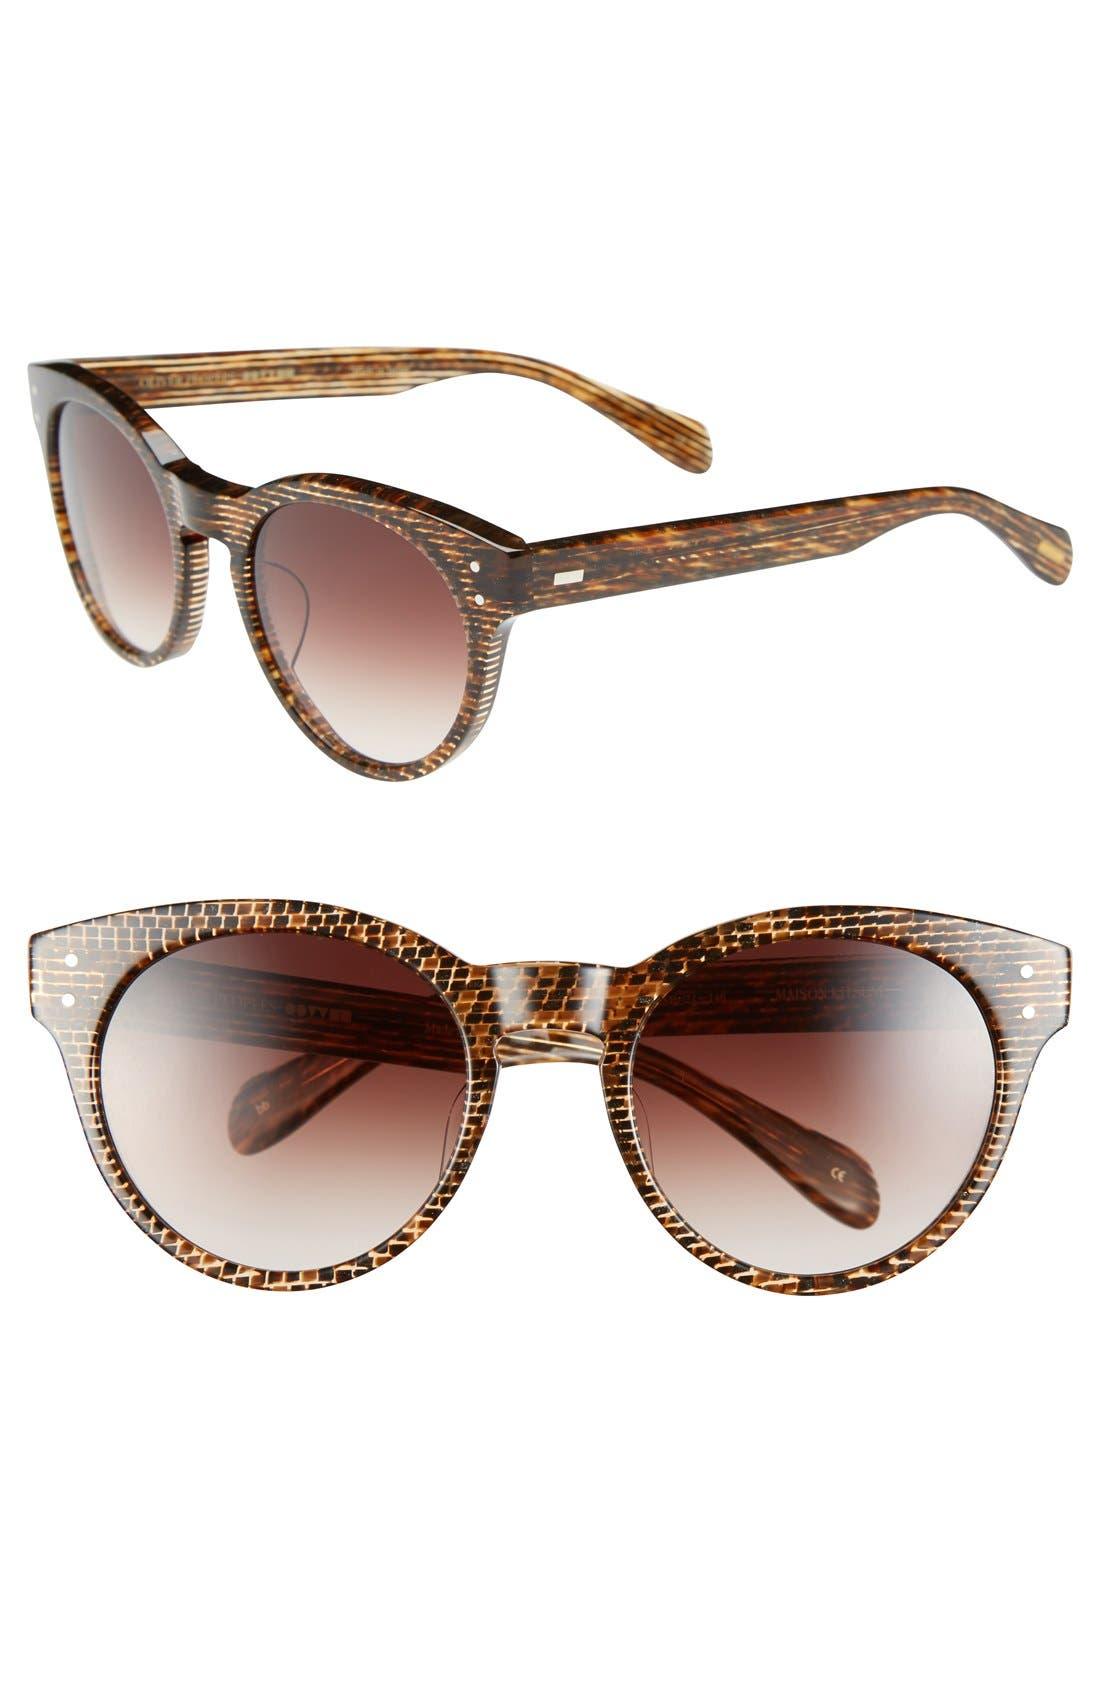 Alternate Image 1 Selected - Oliver Peoples x Maison Kitsuné 'Paris' 51mm Retro Sunglasses